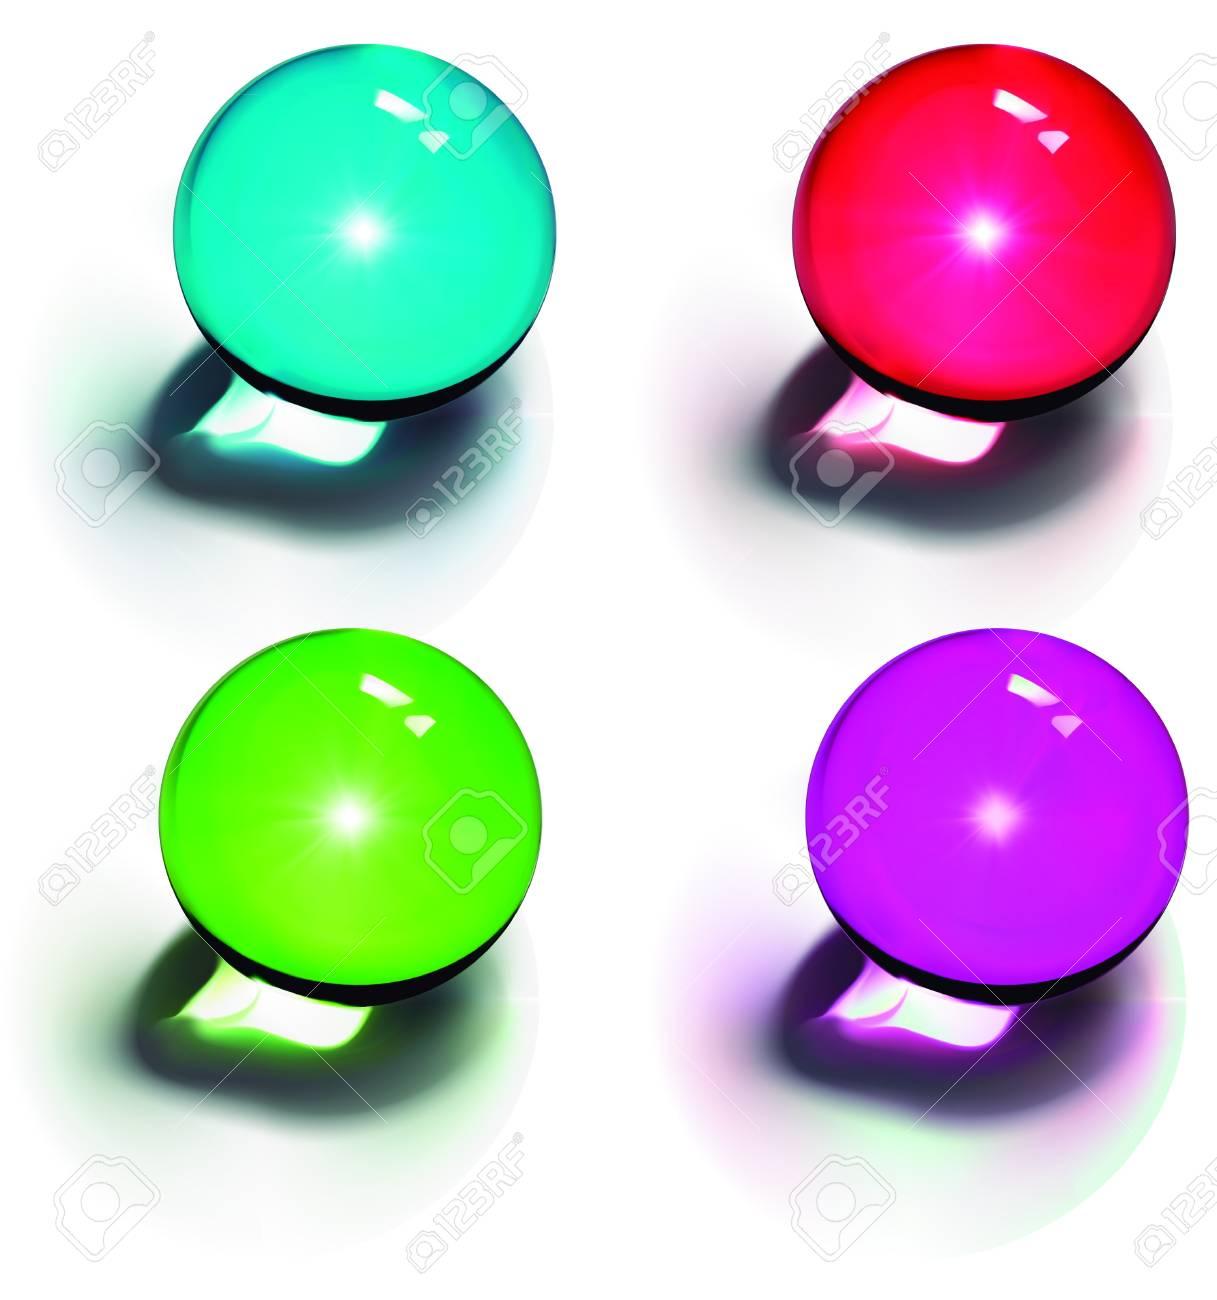 Vector Crystal Balls Stock Vector - 12493782